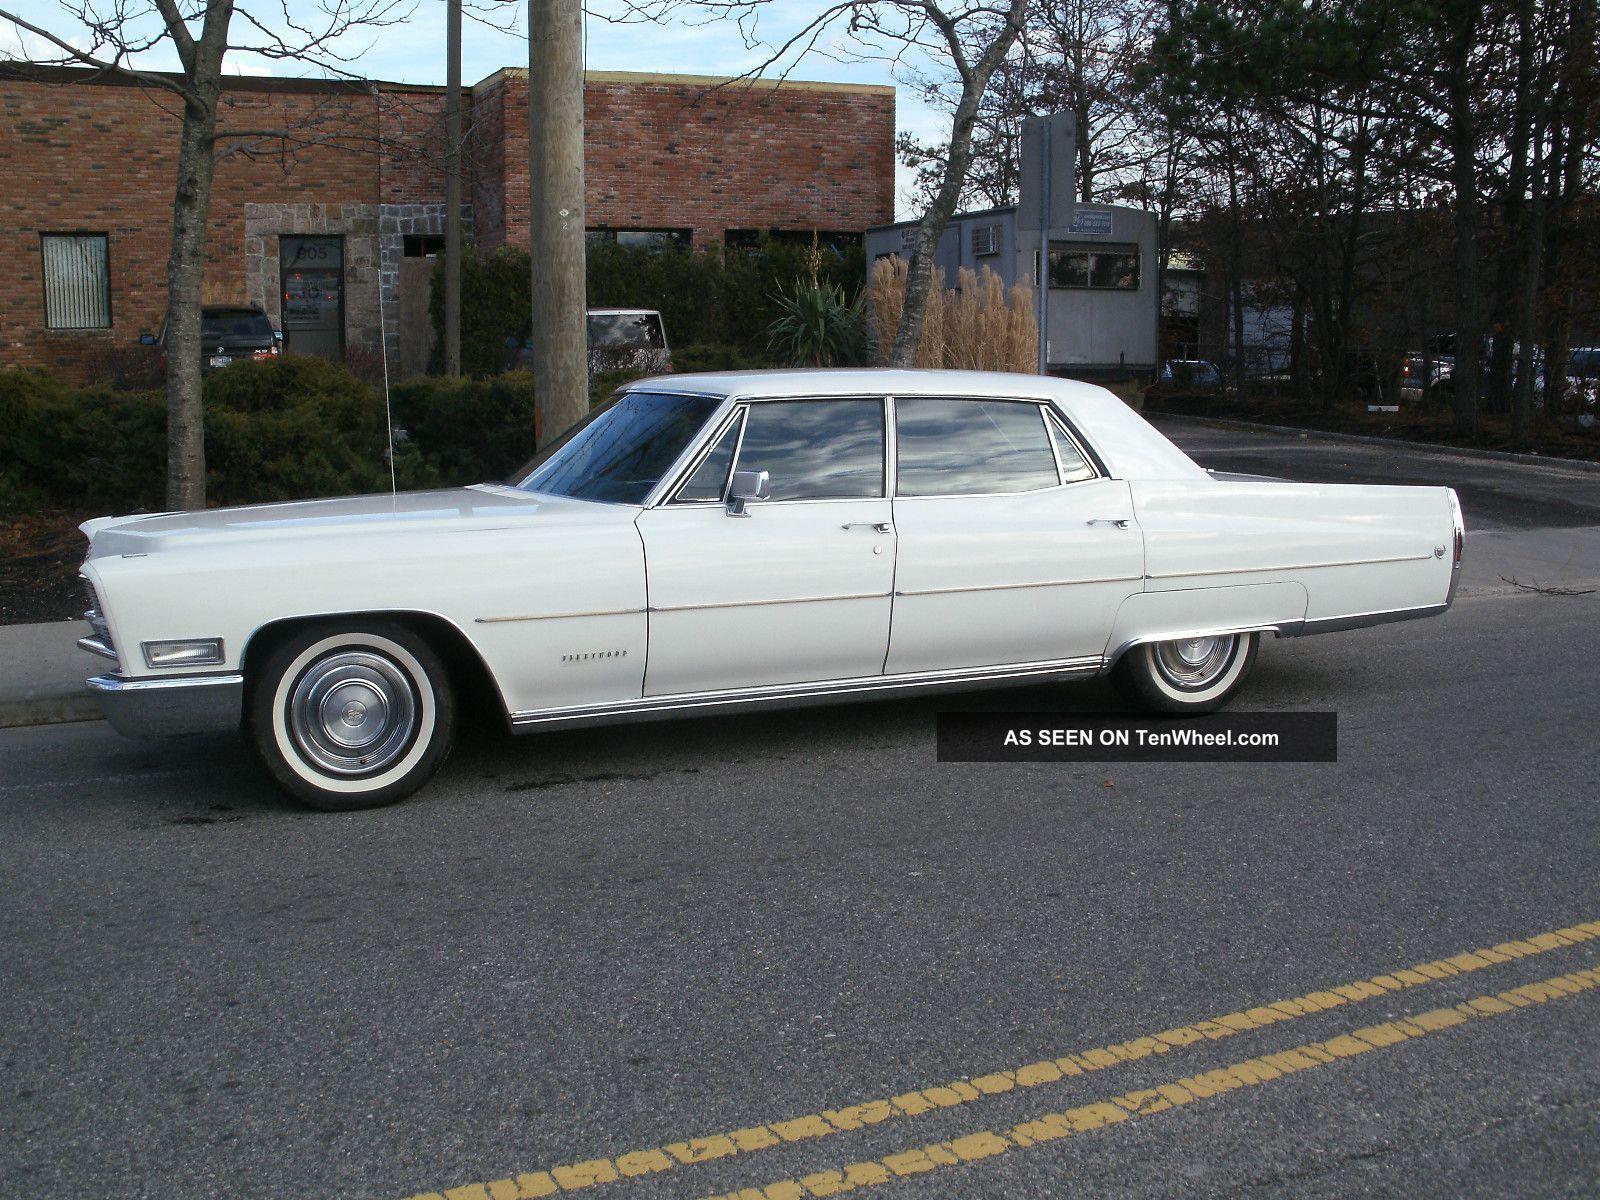 1968 Cadillac Fleetwood 4 Dr